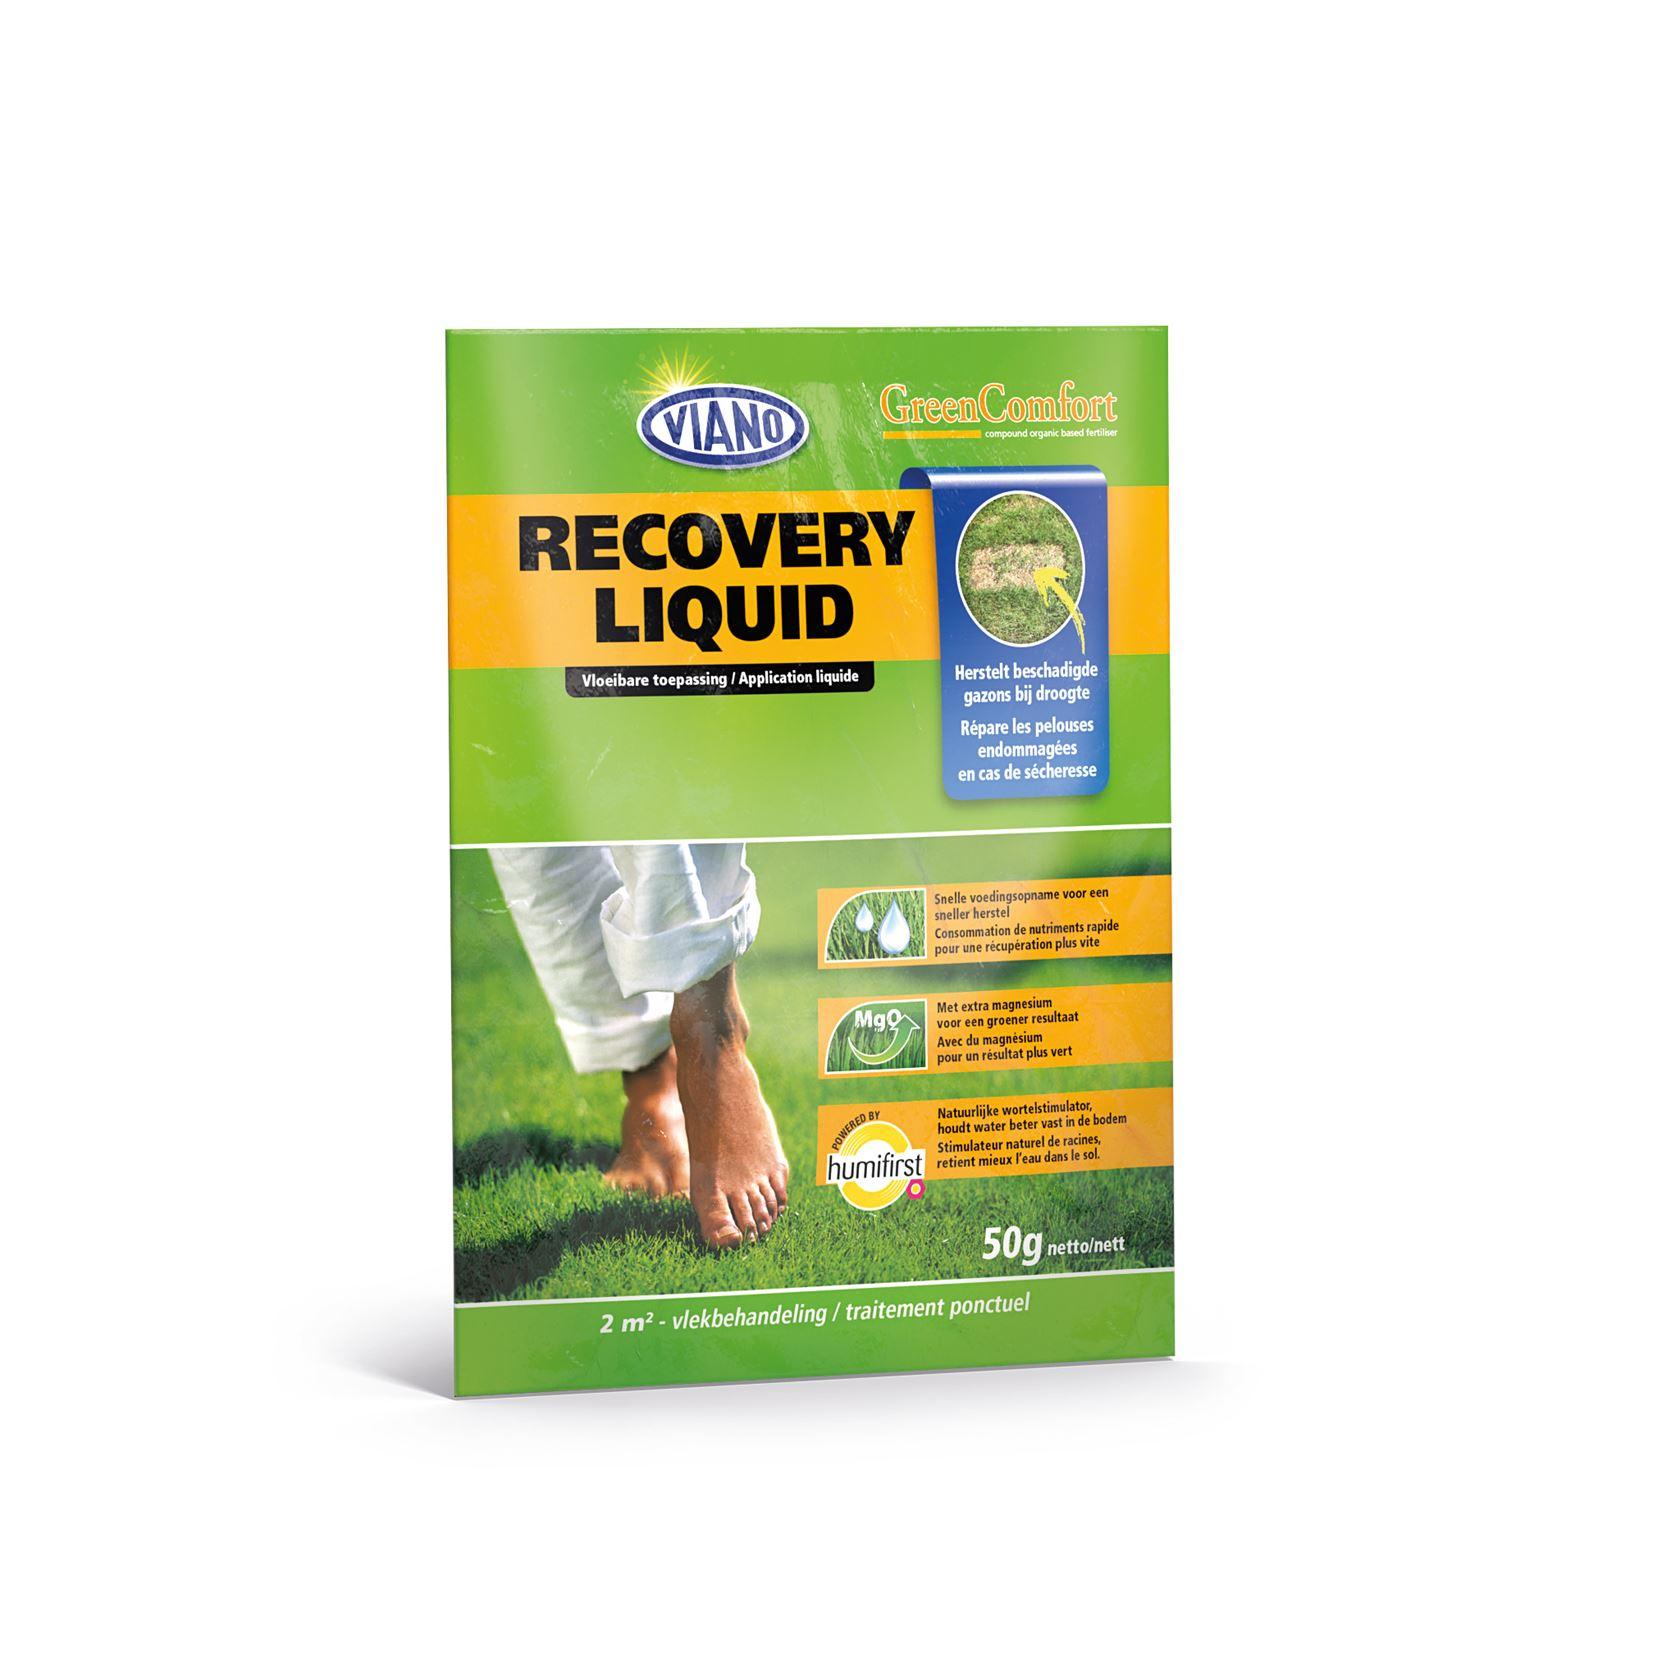 Viano-Recovery-meststof-liquid-50gr